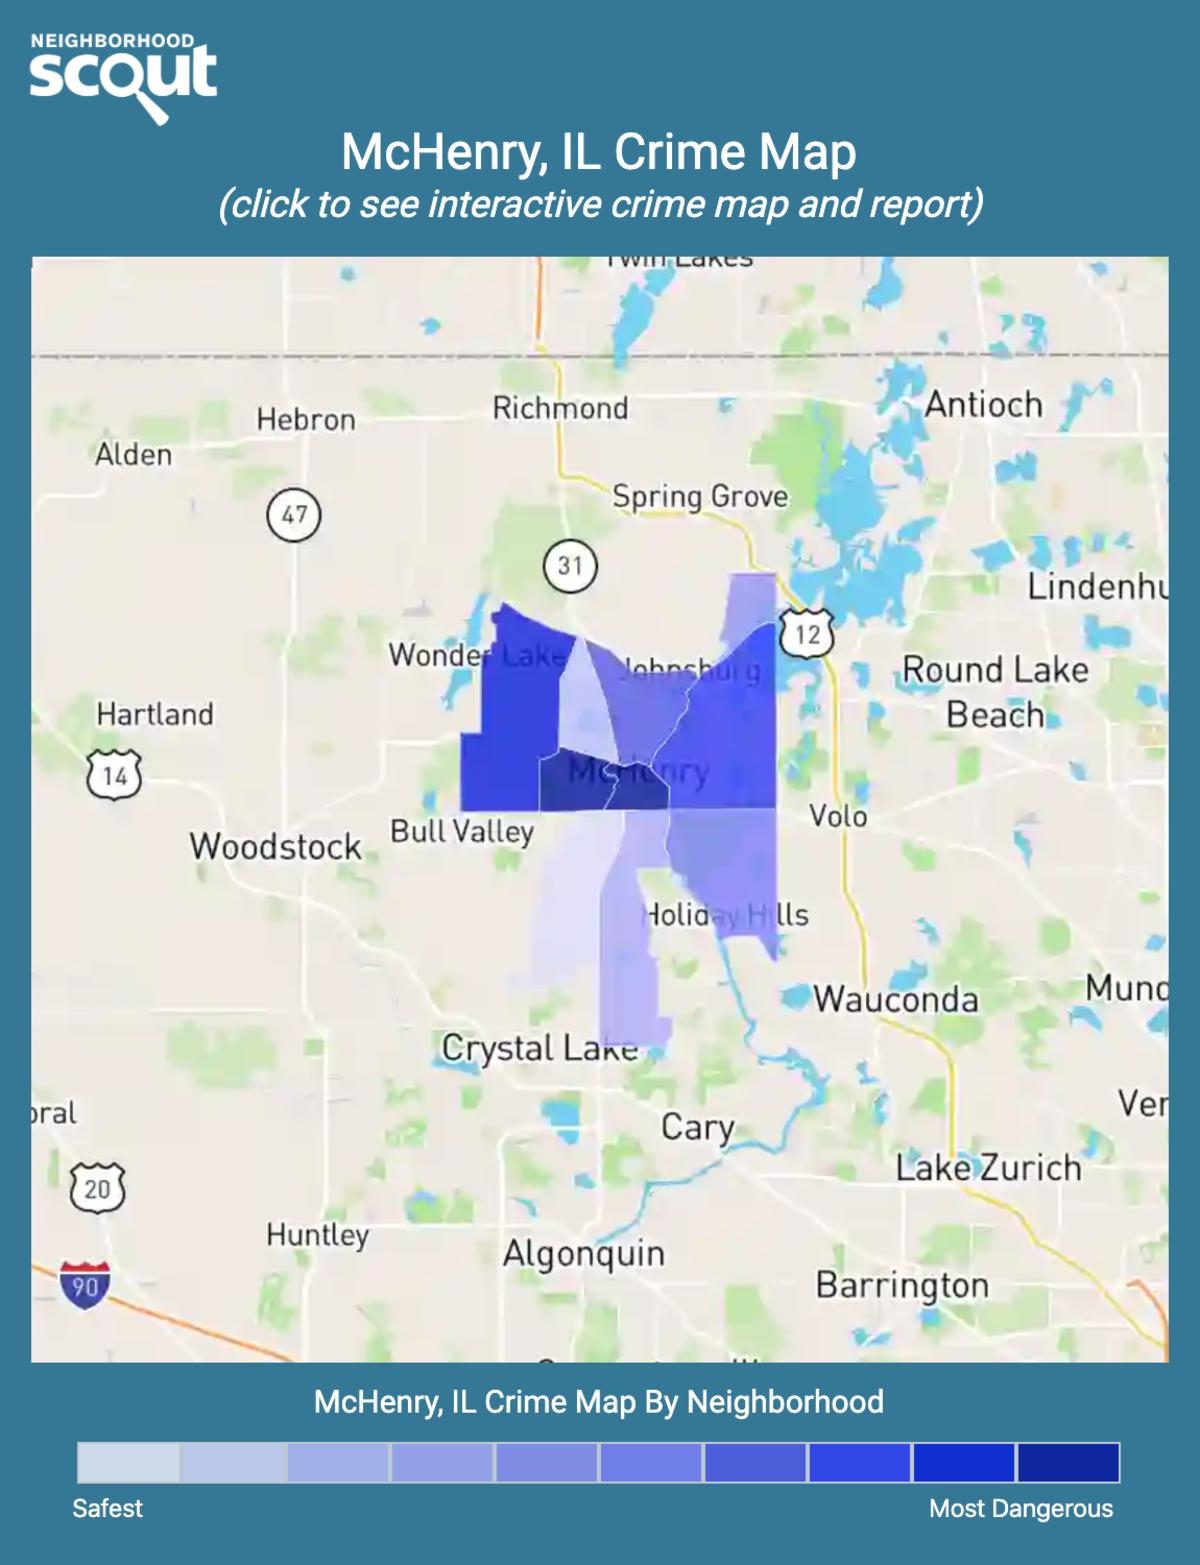 McHenry, Illinois crime map